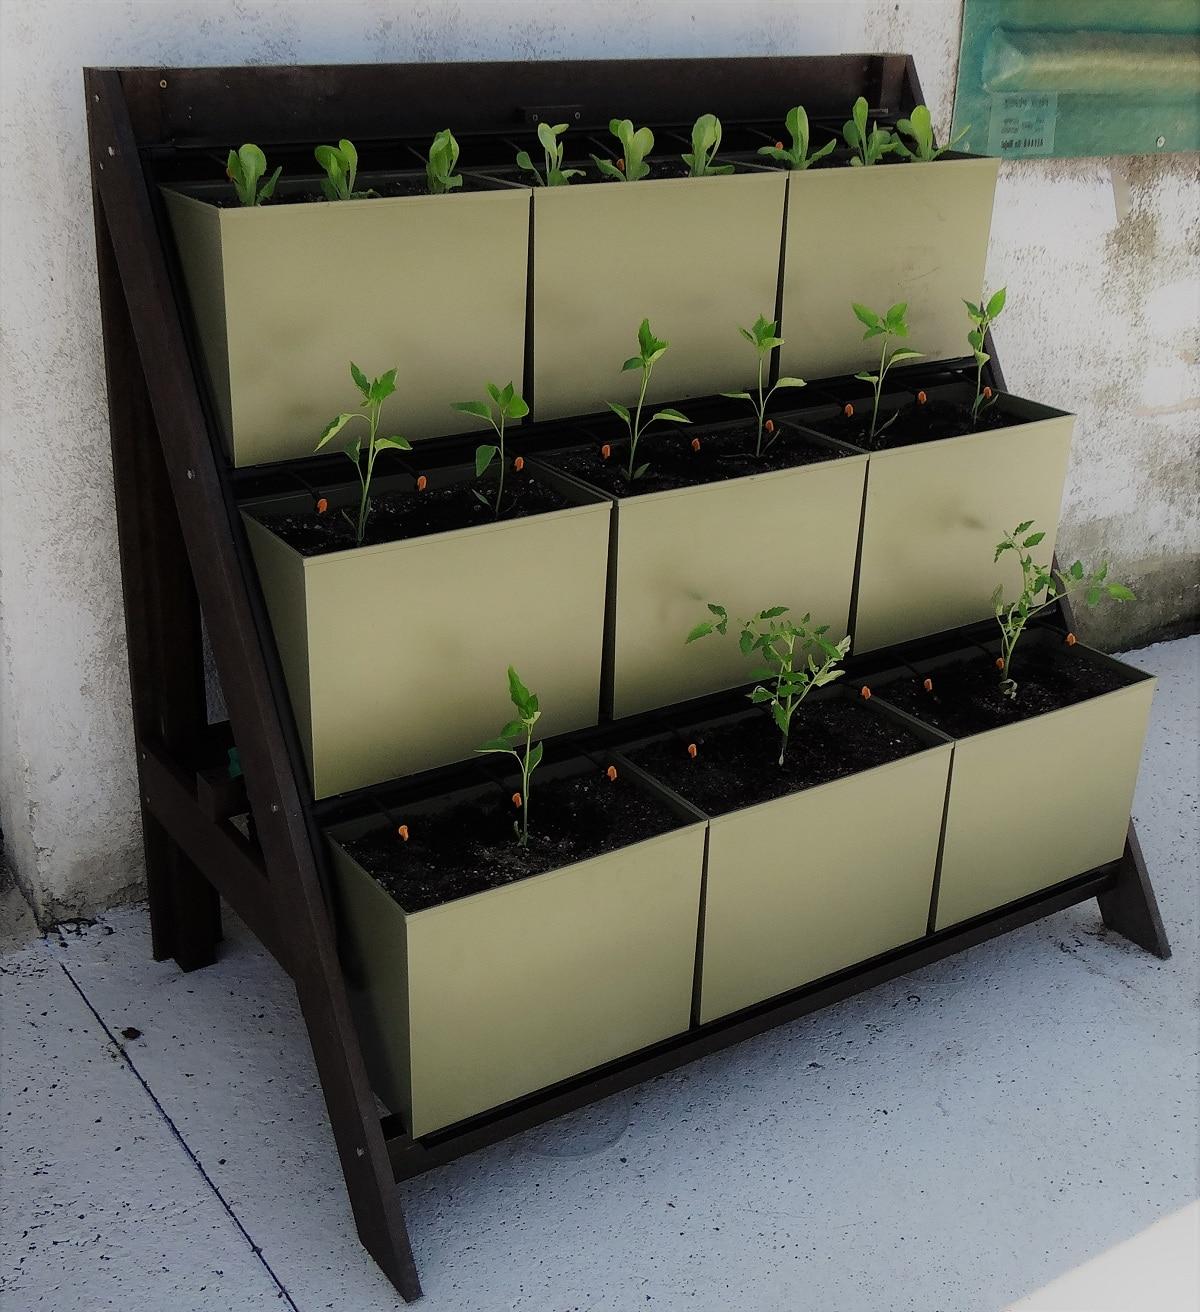 cajas en vertical